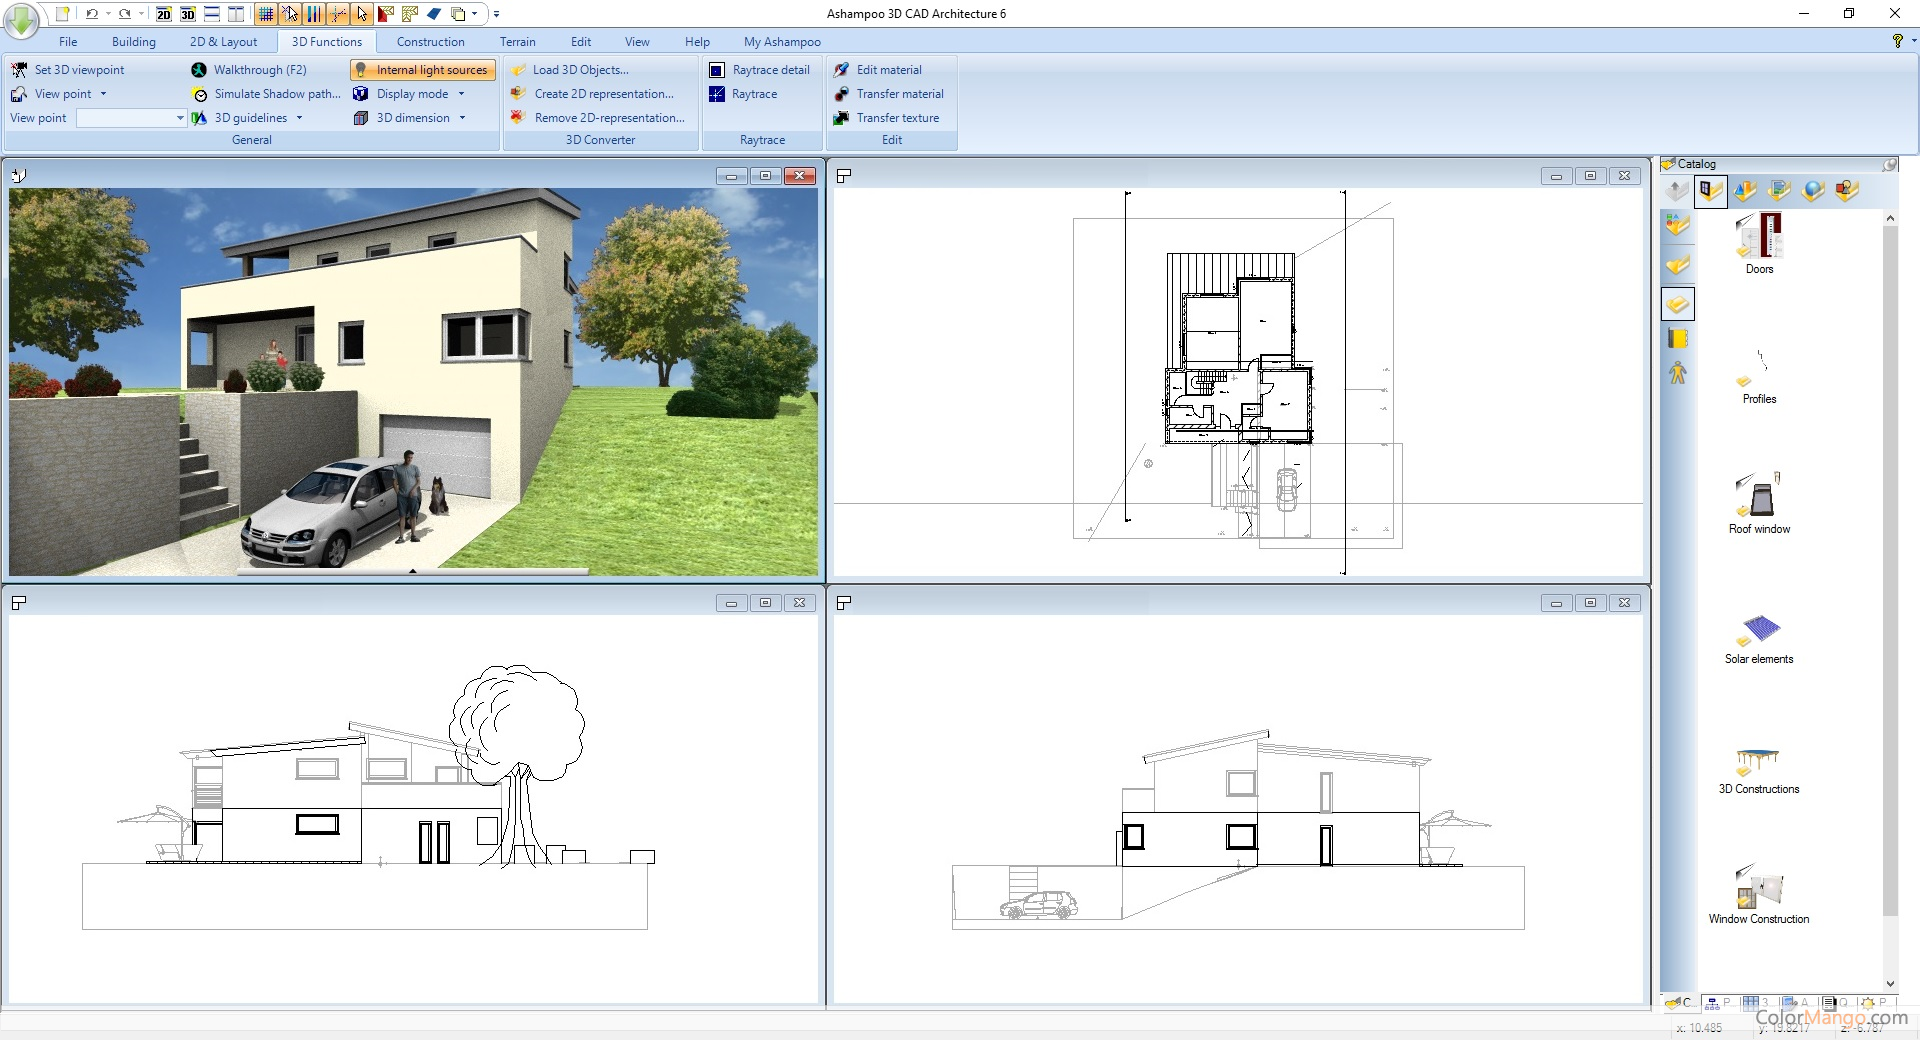 Ashampoo home designer pro 300 multilingual jobs | Best home style ...